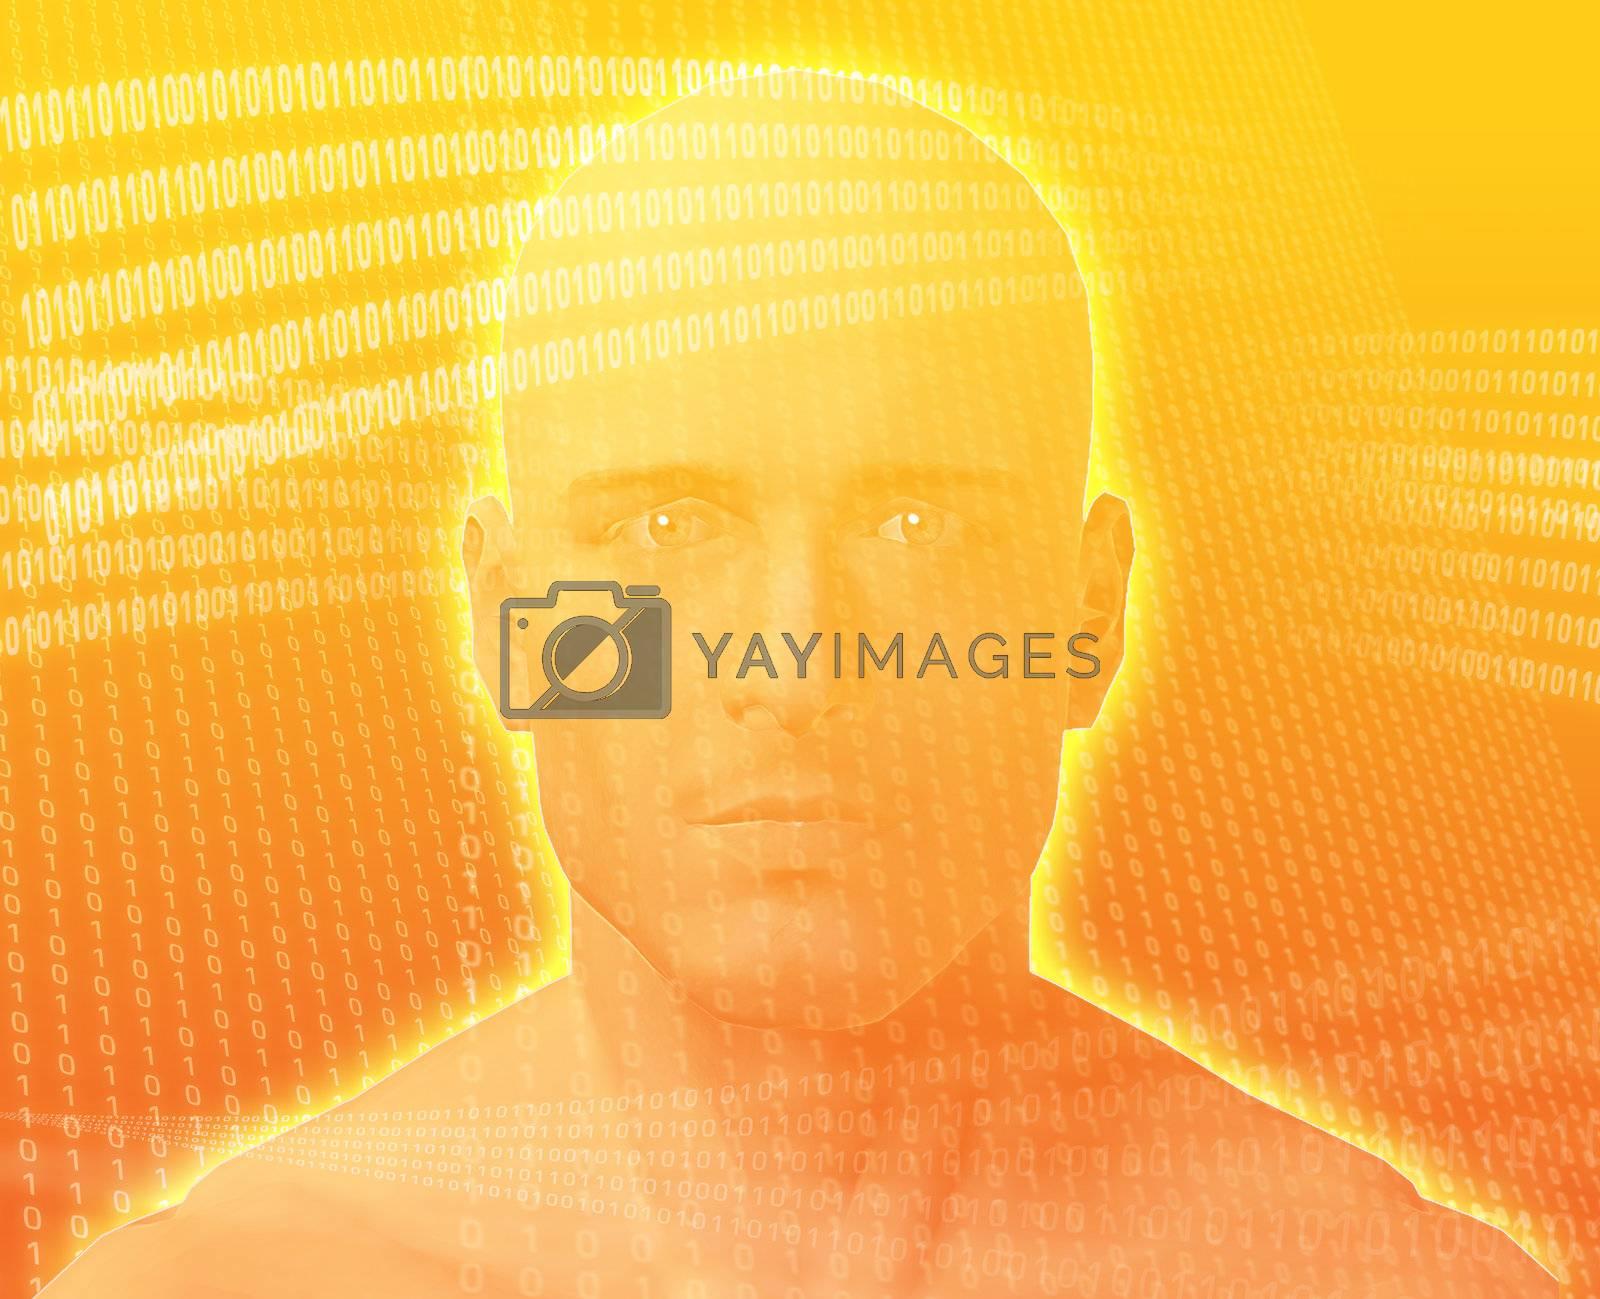 Royalty free image of Digital Man by kgtoh